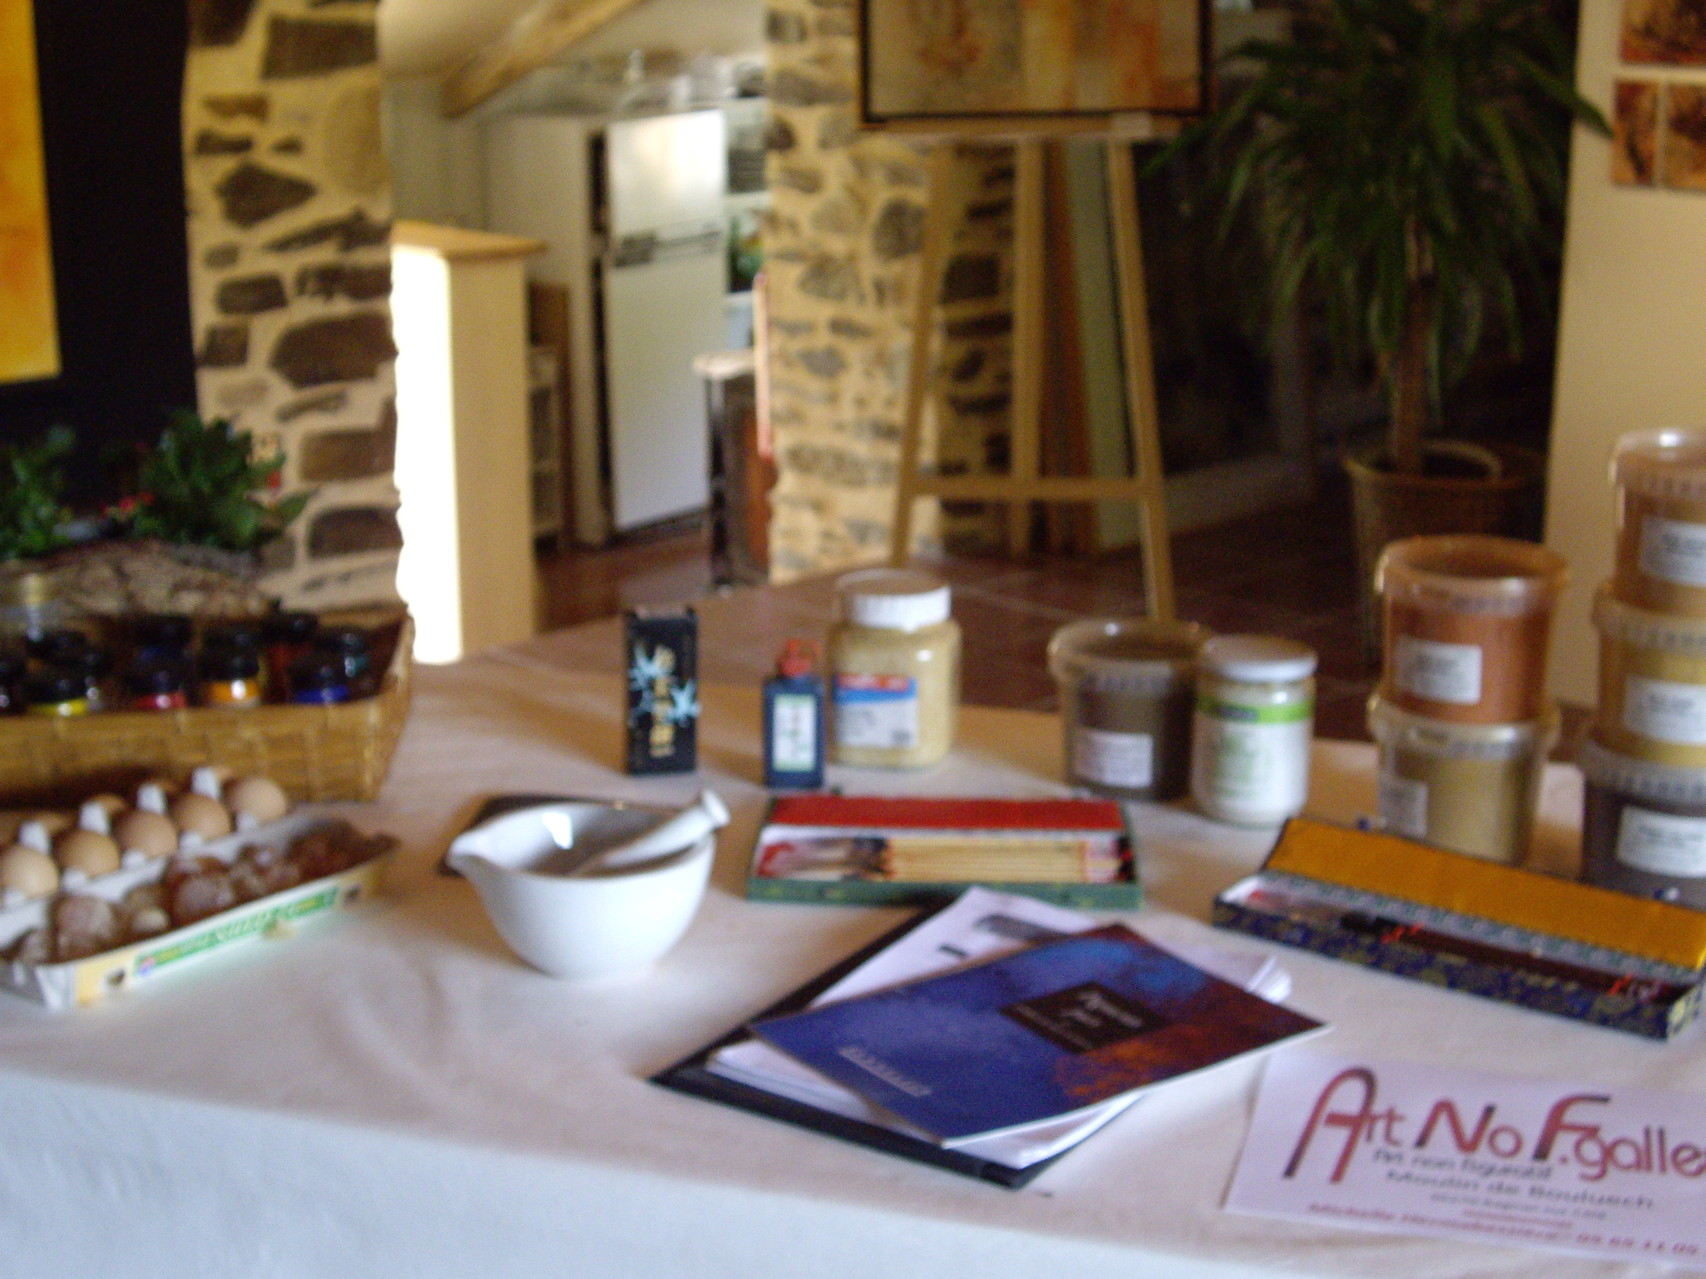 """Journées nature de Midi-Pyrénées"" du 24 mai au 1er juin 2008 Moulin de Bouluech"